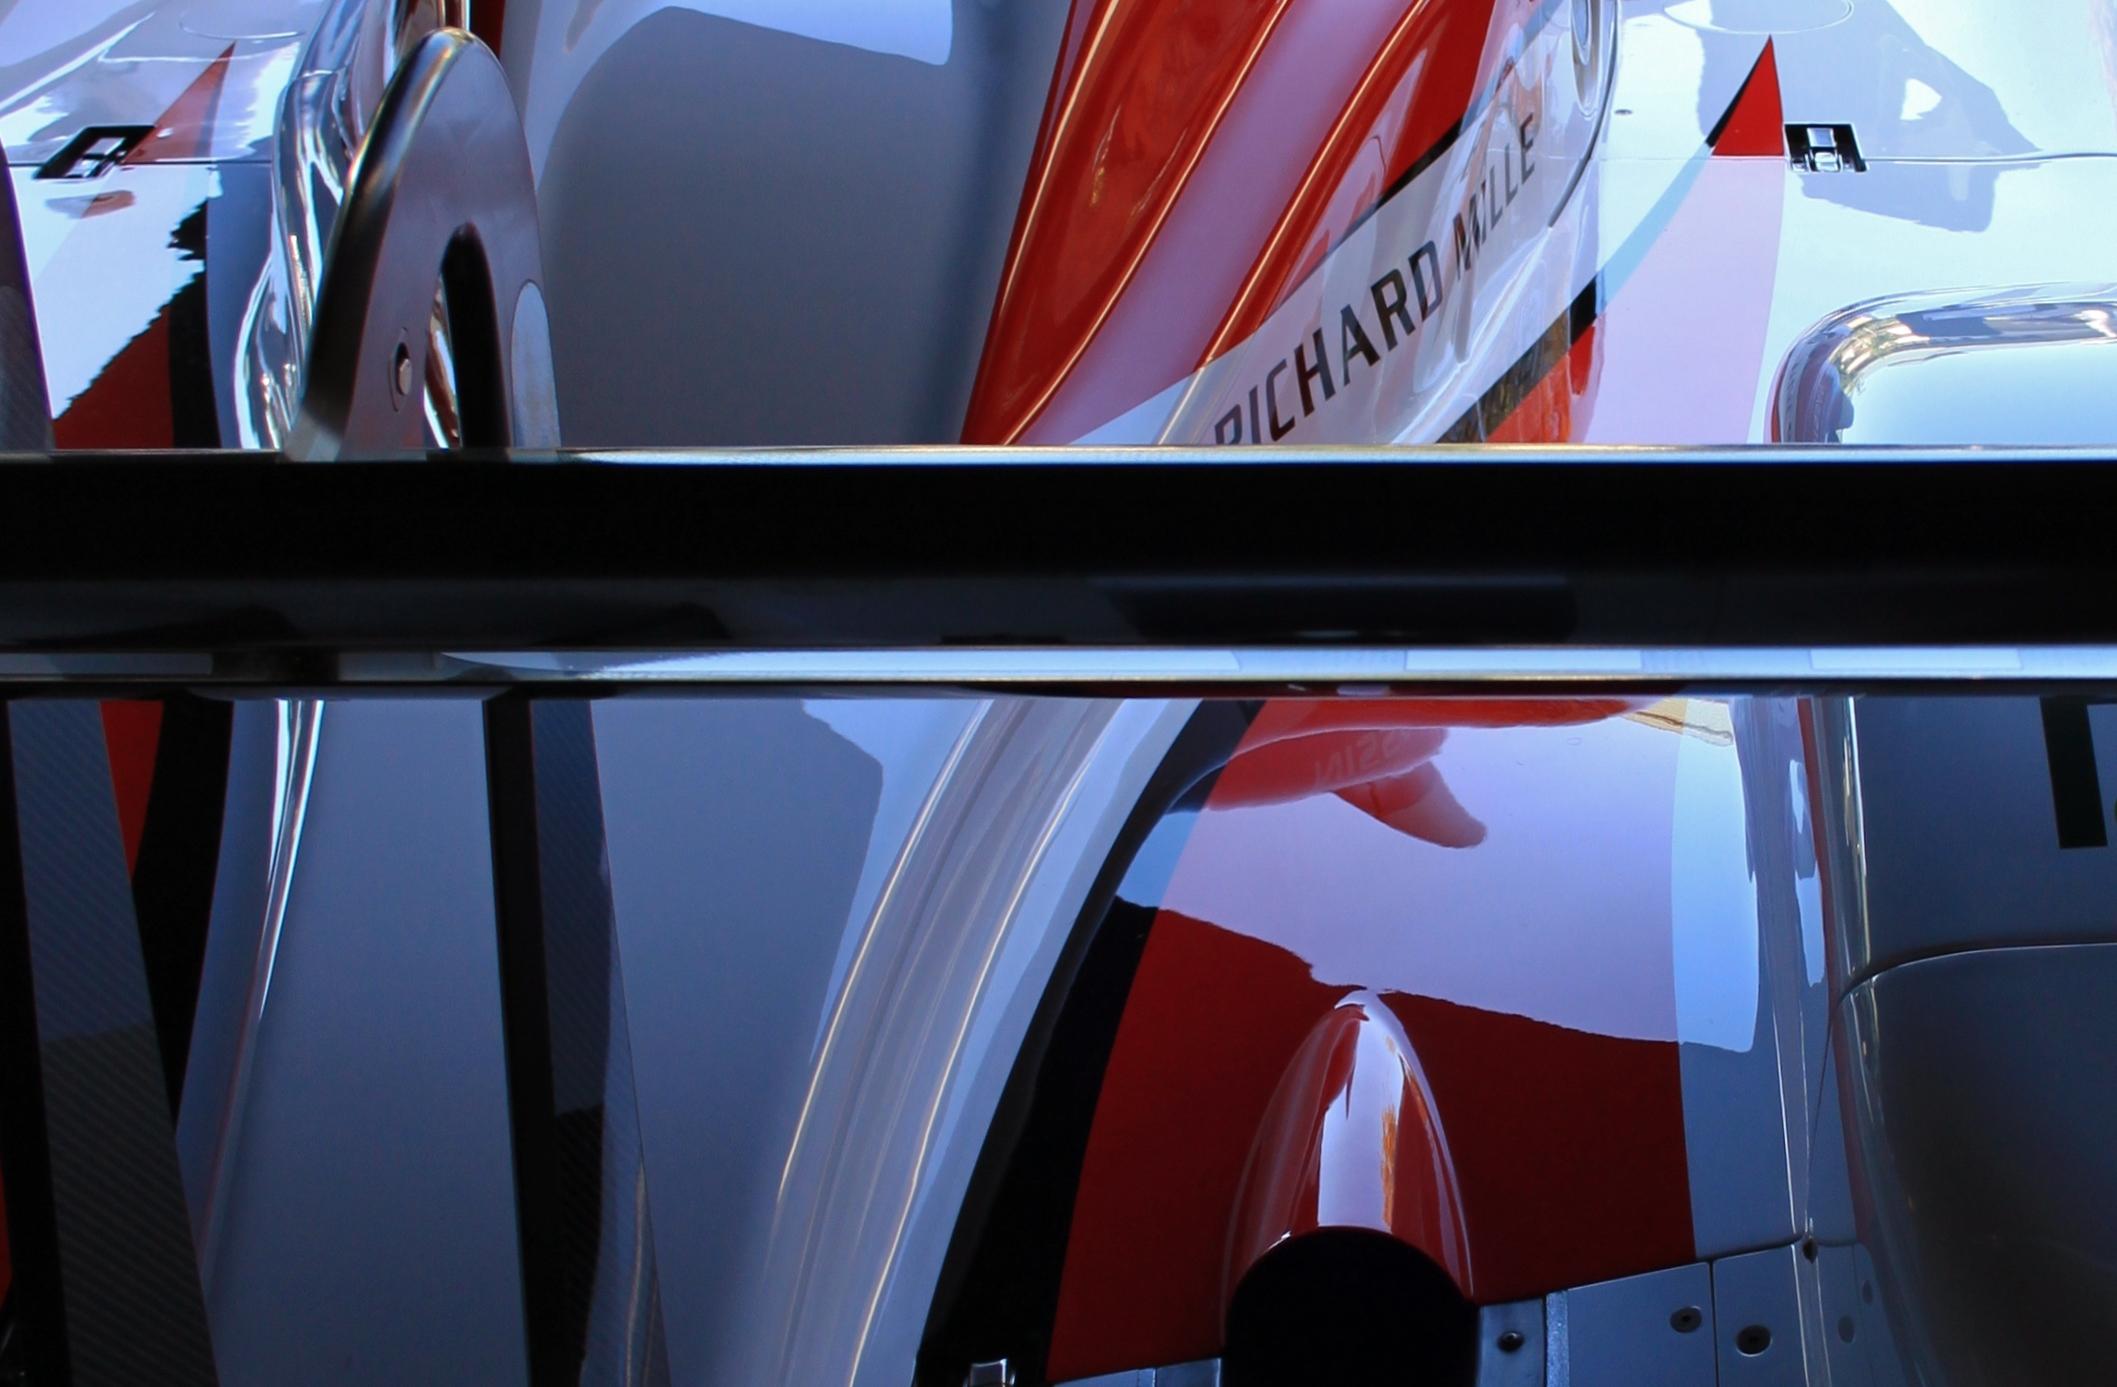 Greaves Motorsport Zytec-Nissan LMP2 prototype Le Mans 2012 rear detail